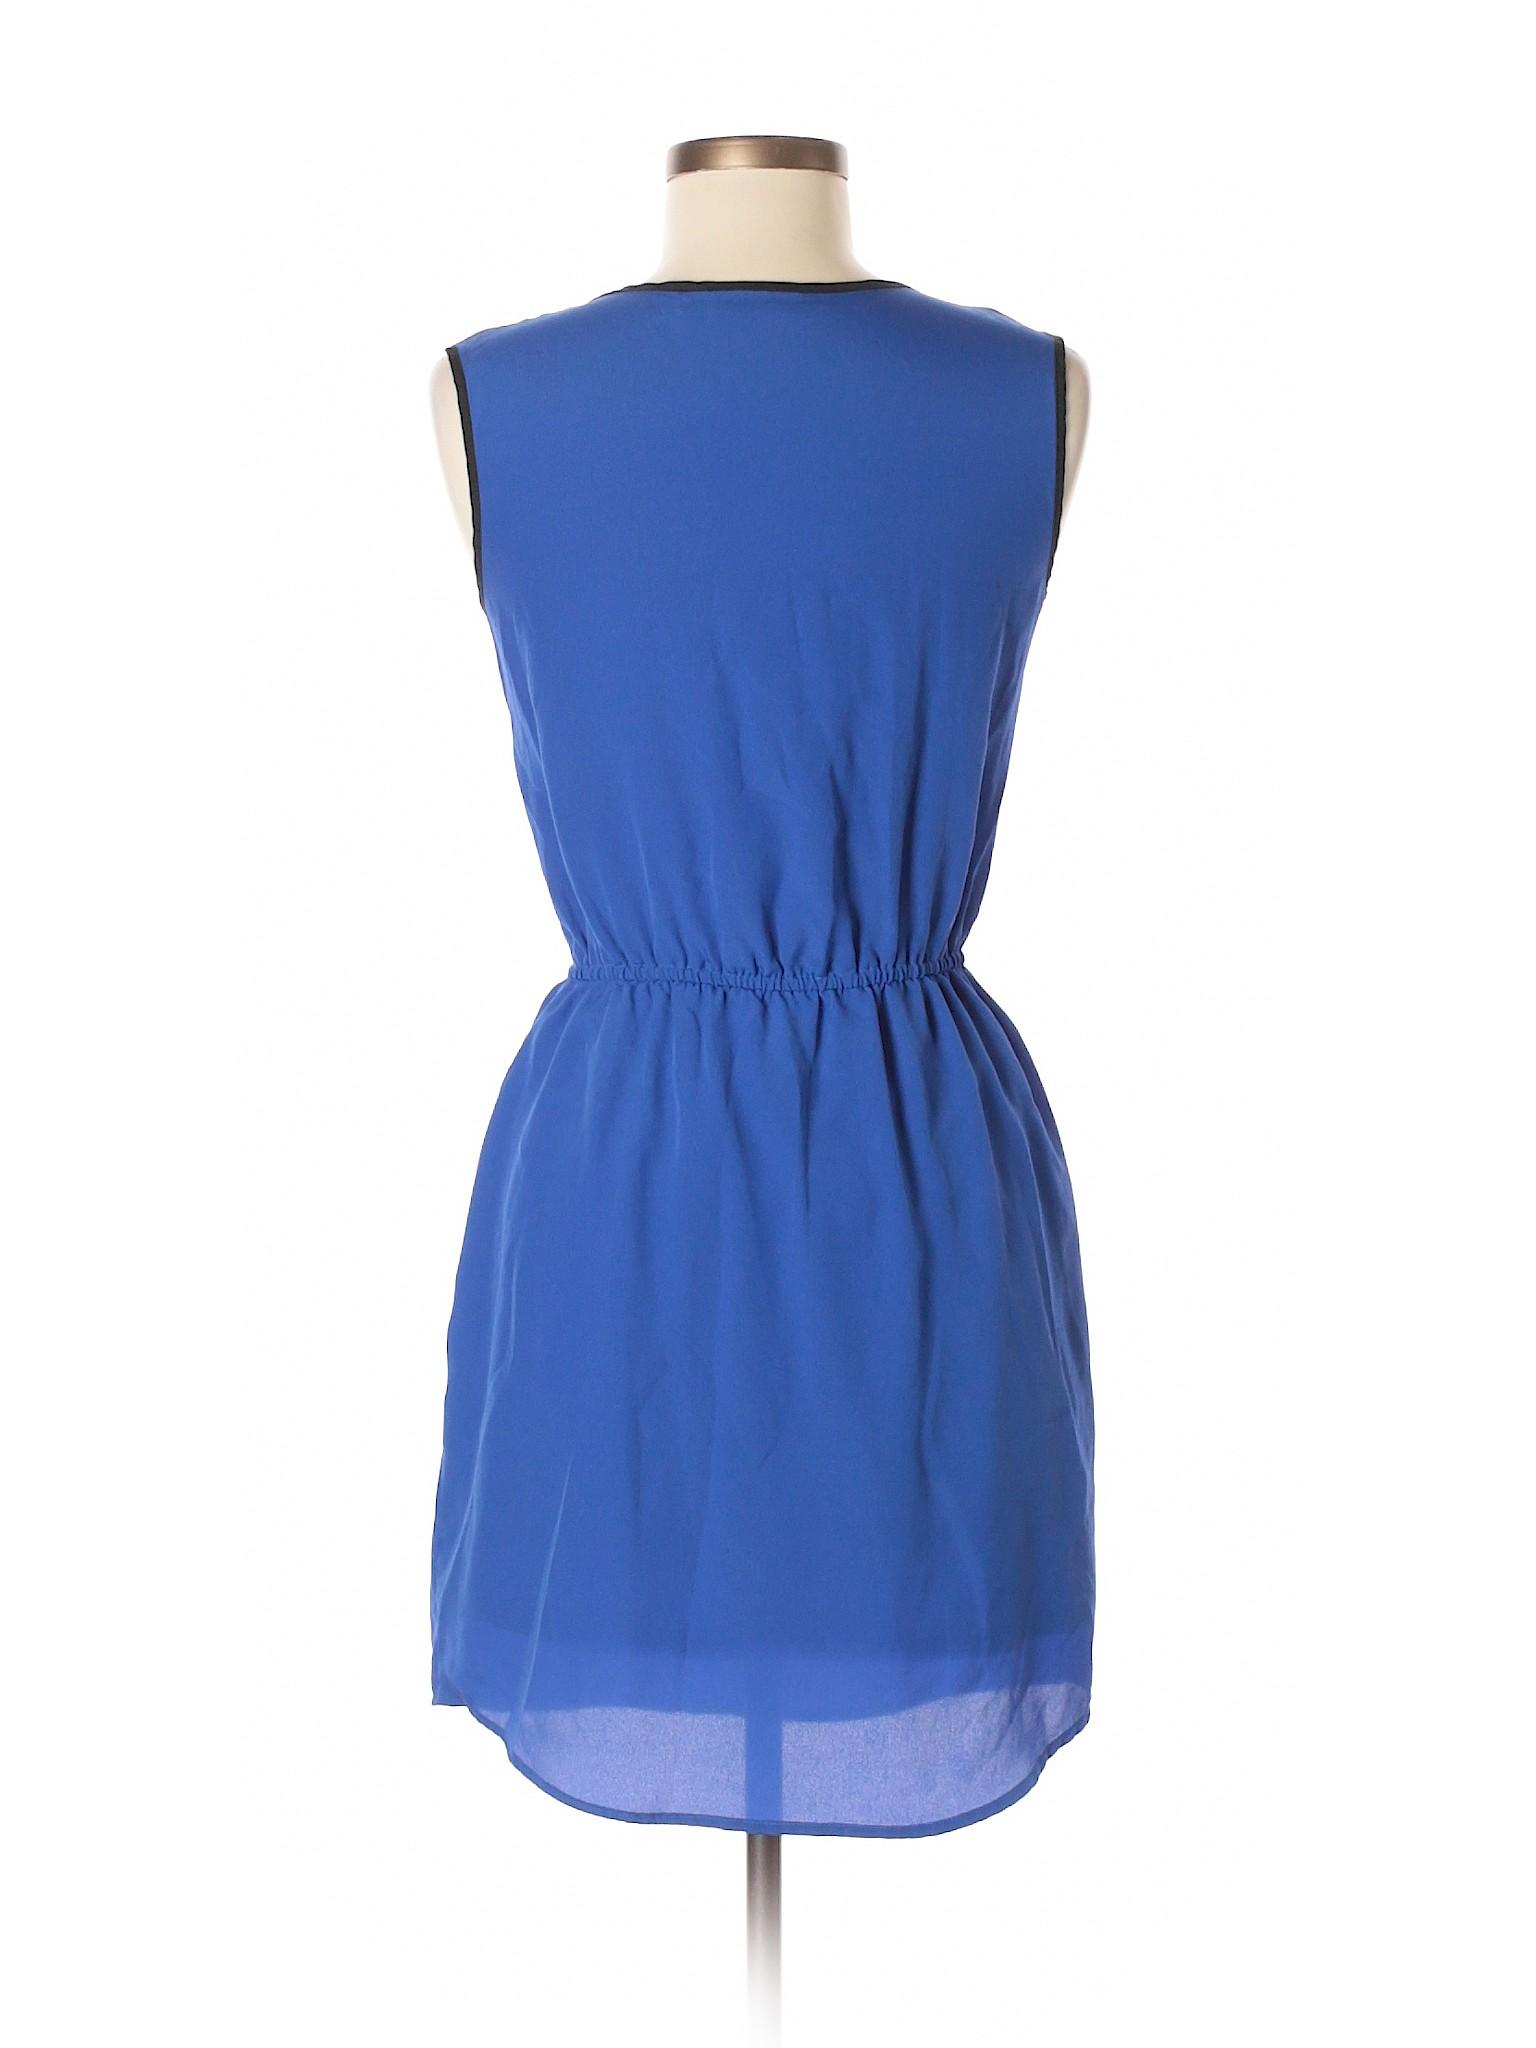 Apt 9 Boutique Dress Casual winter UHWw1q